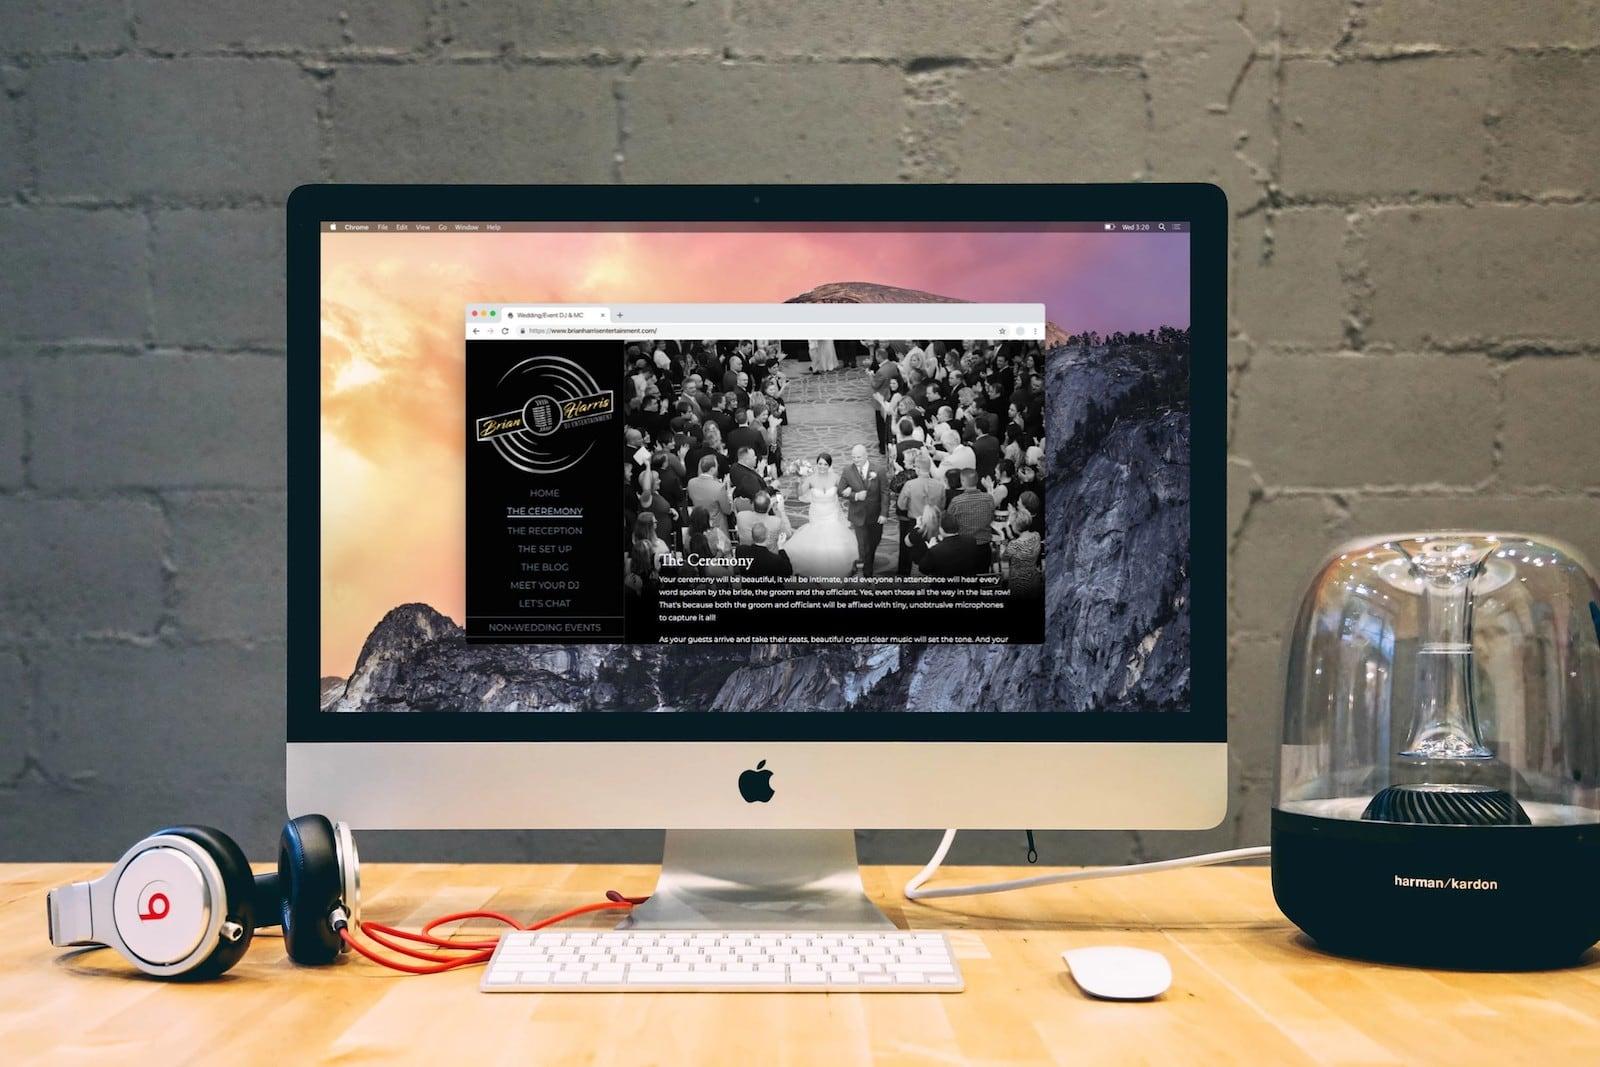 Brian Harris Entertainment dot com homepage on desktop screen.